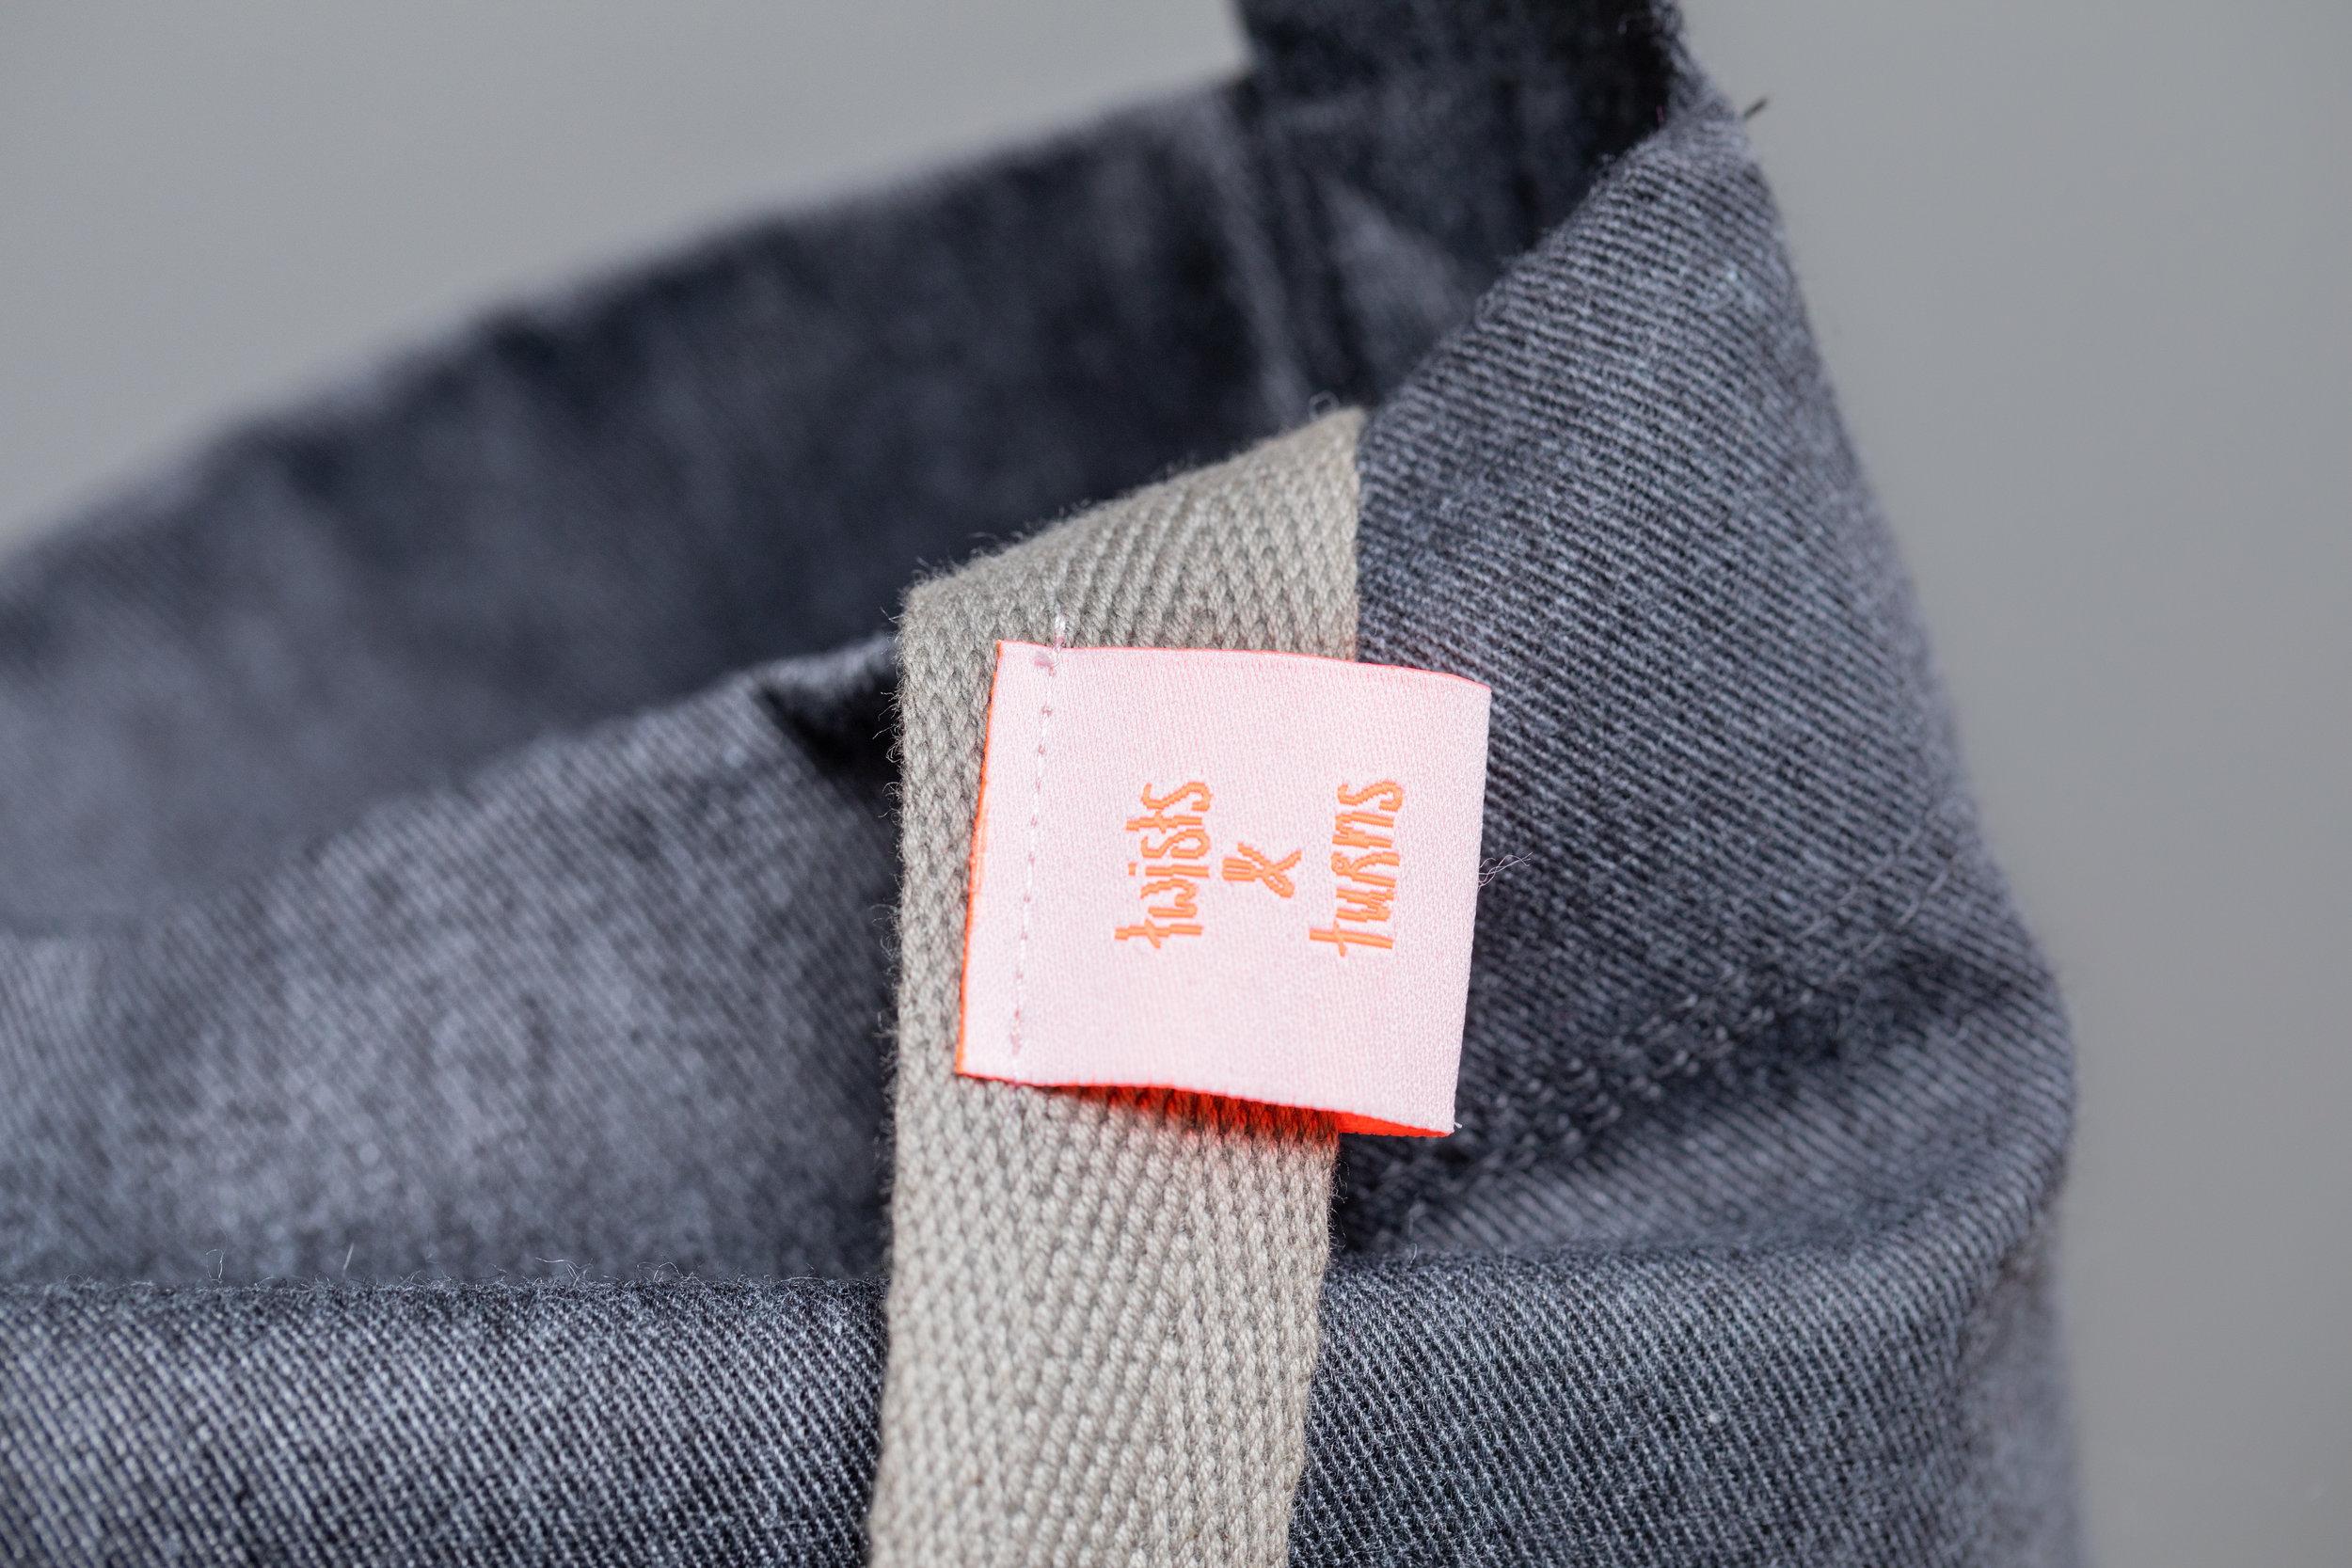 twists and turns tote bag nin detail label.jpg